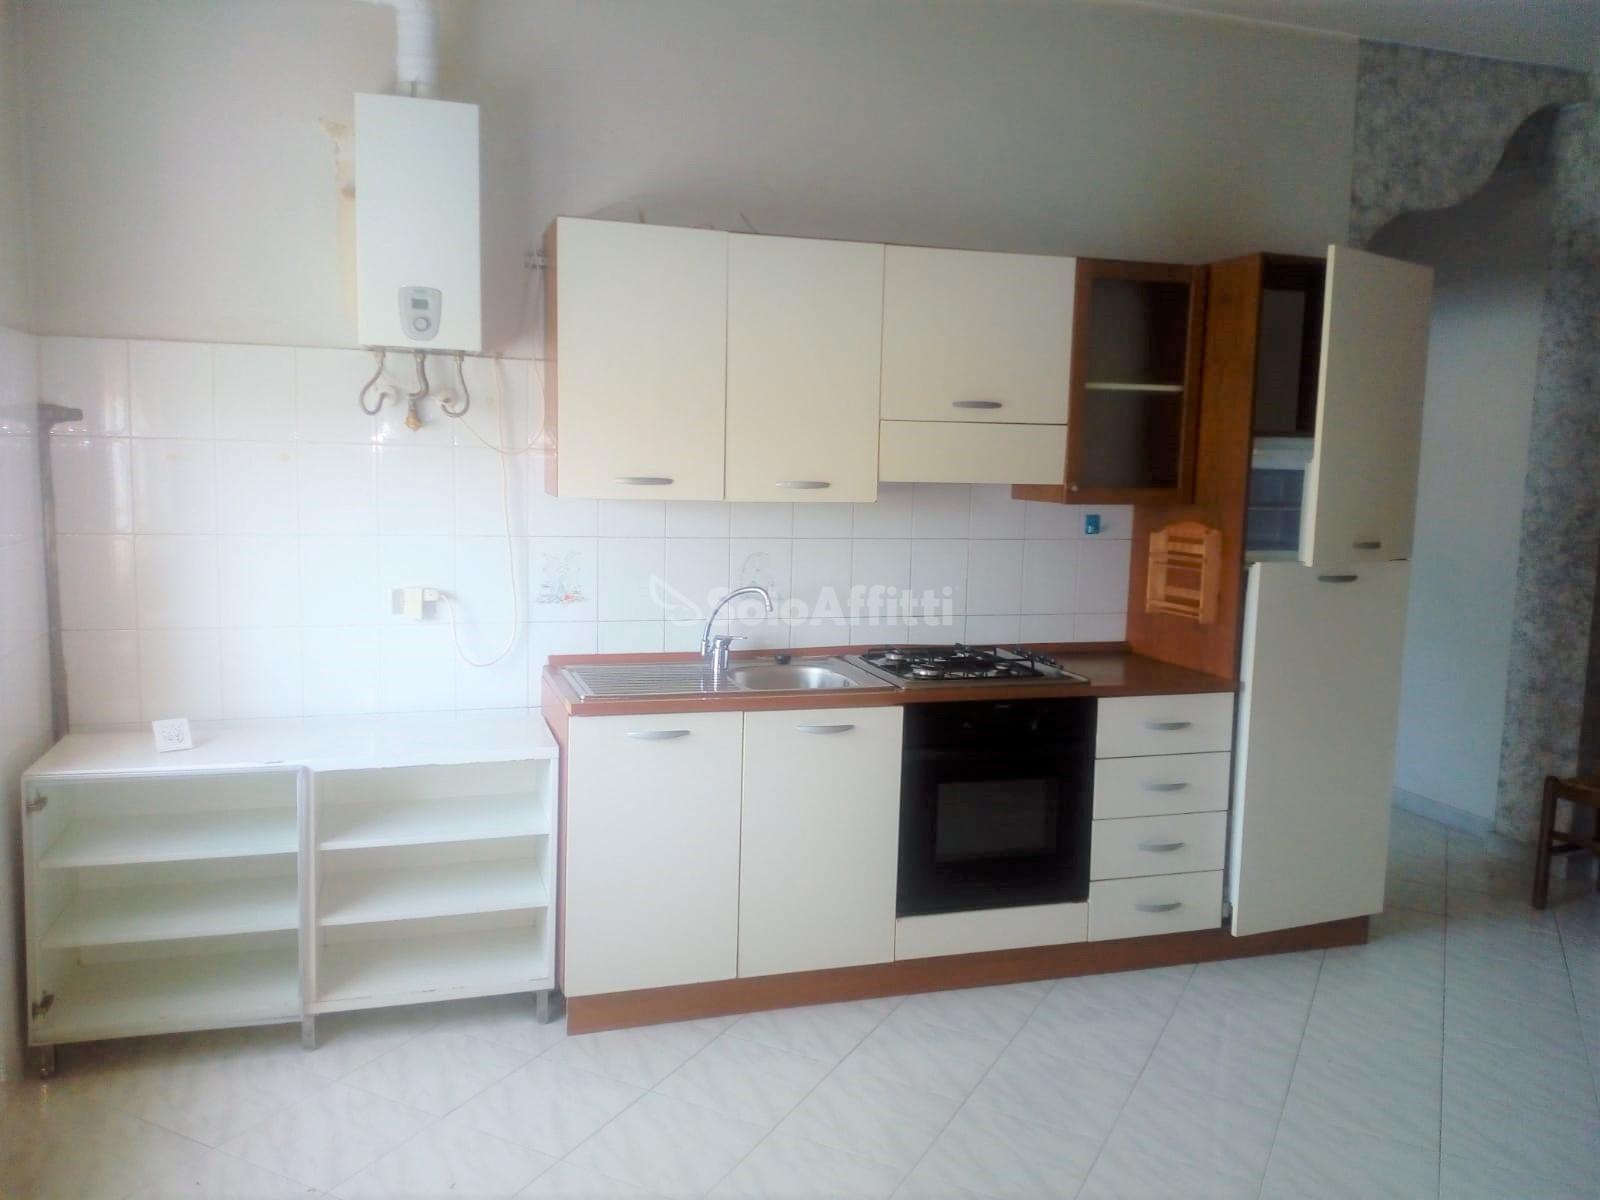 cucina a vista 2.jpg